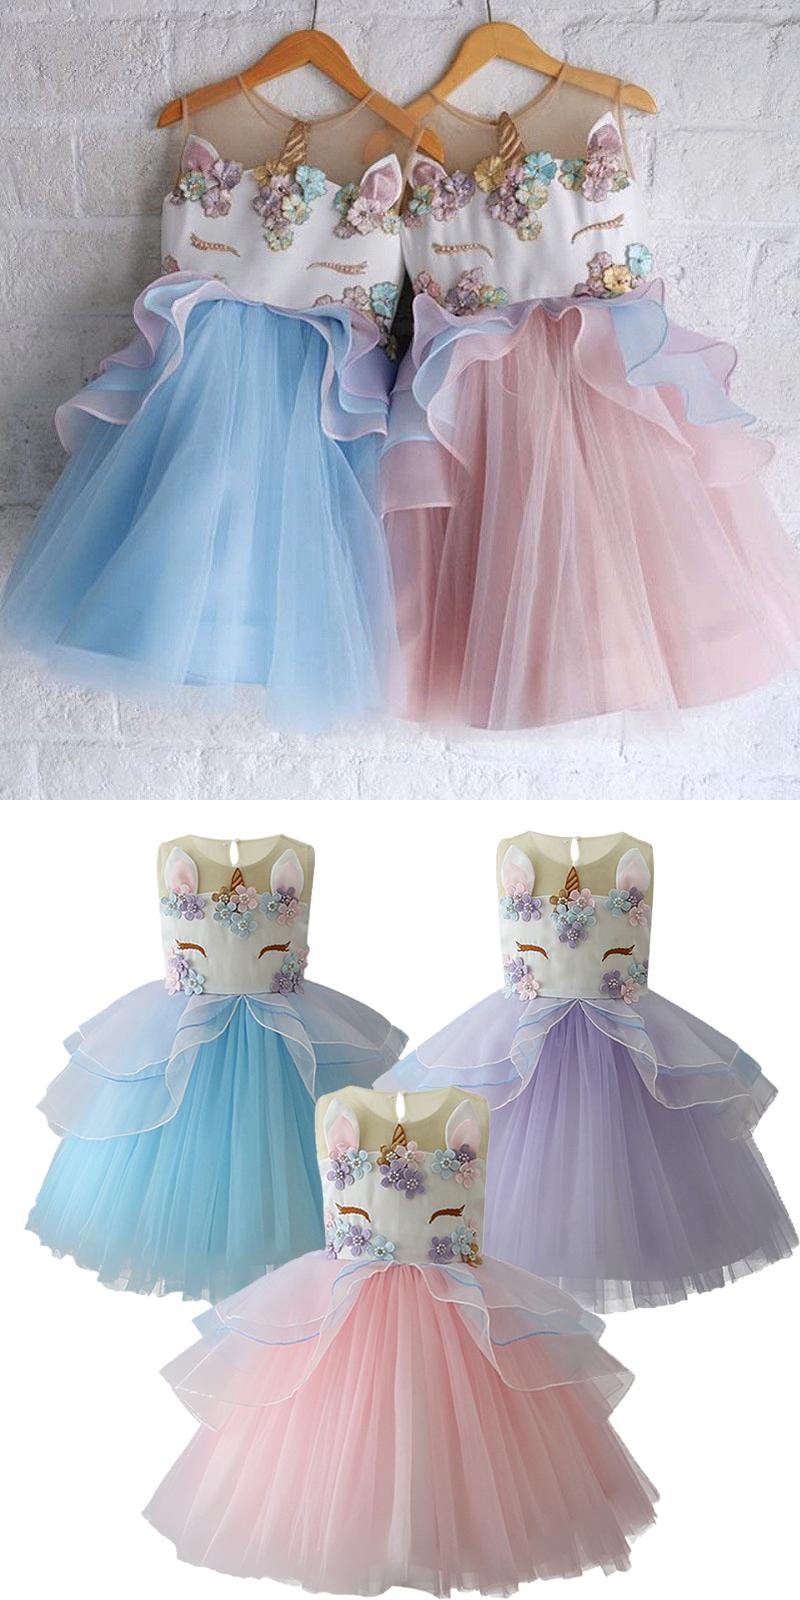 dd7f54d77 Original Unicorn Birthday Dress. Original Unicorn Birthday Dress Bday Girl,  1st Birthday Girls ...